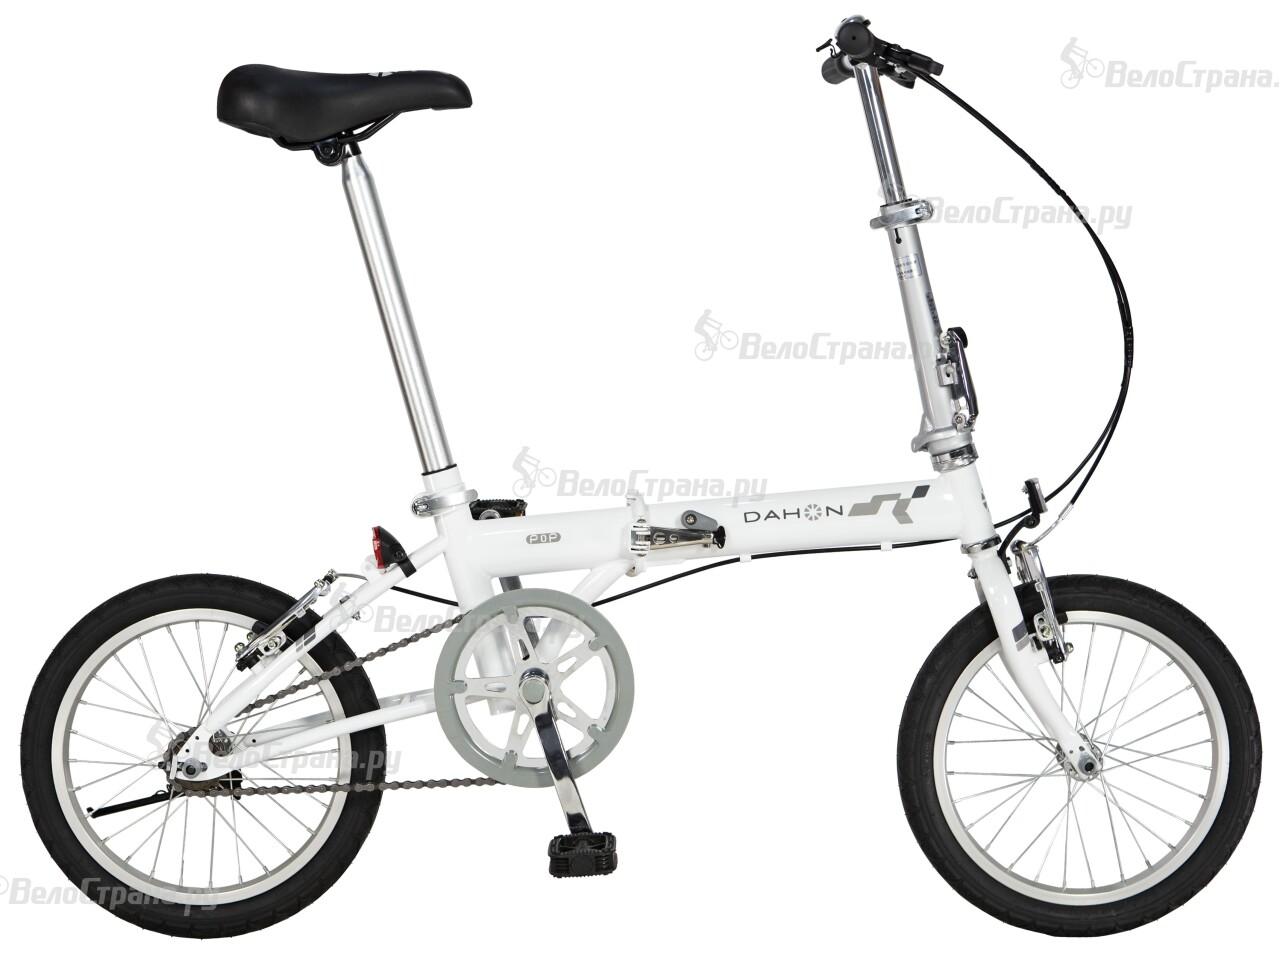 Велосипед Dahon POP Uno (2015) велосипед dahon vybe d7 u 2017